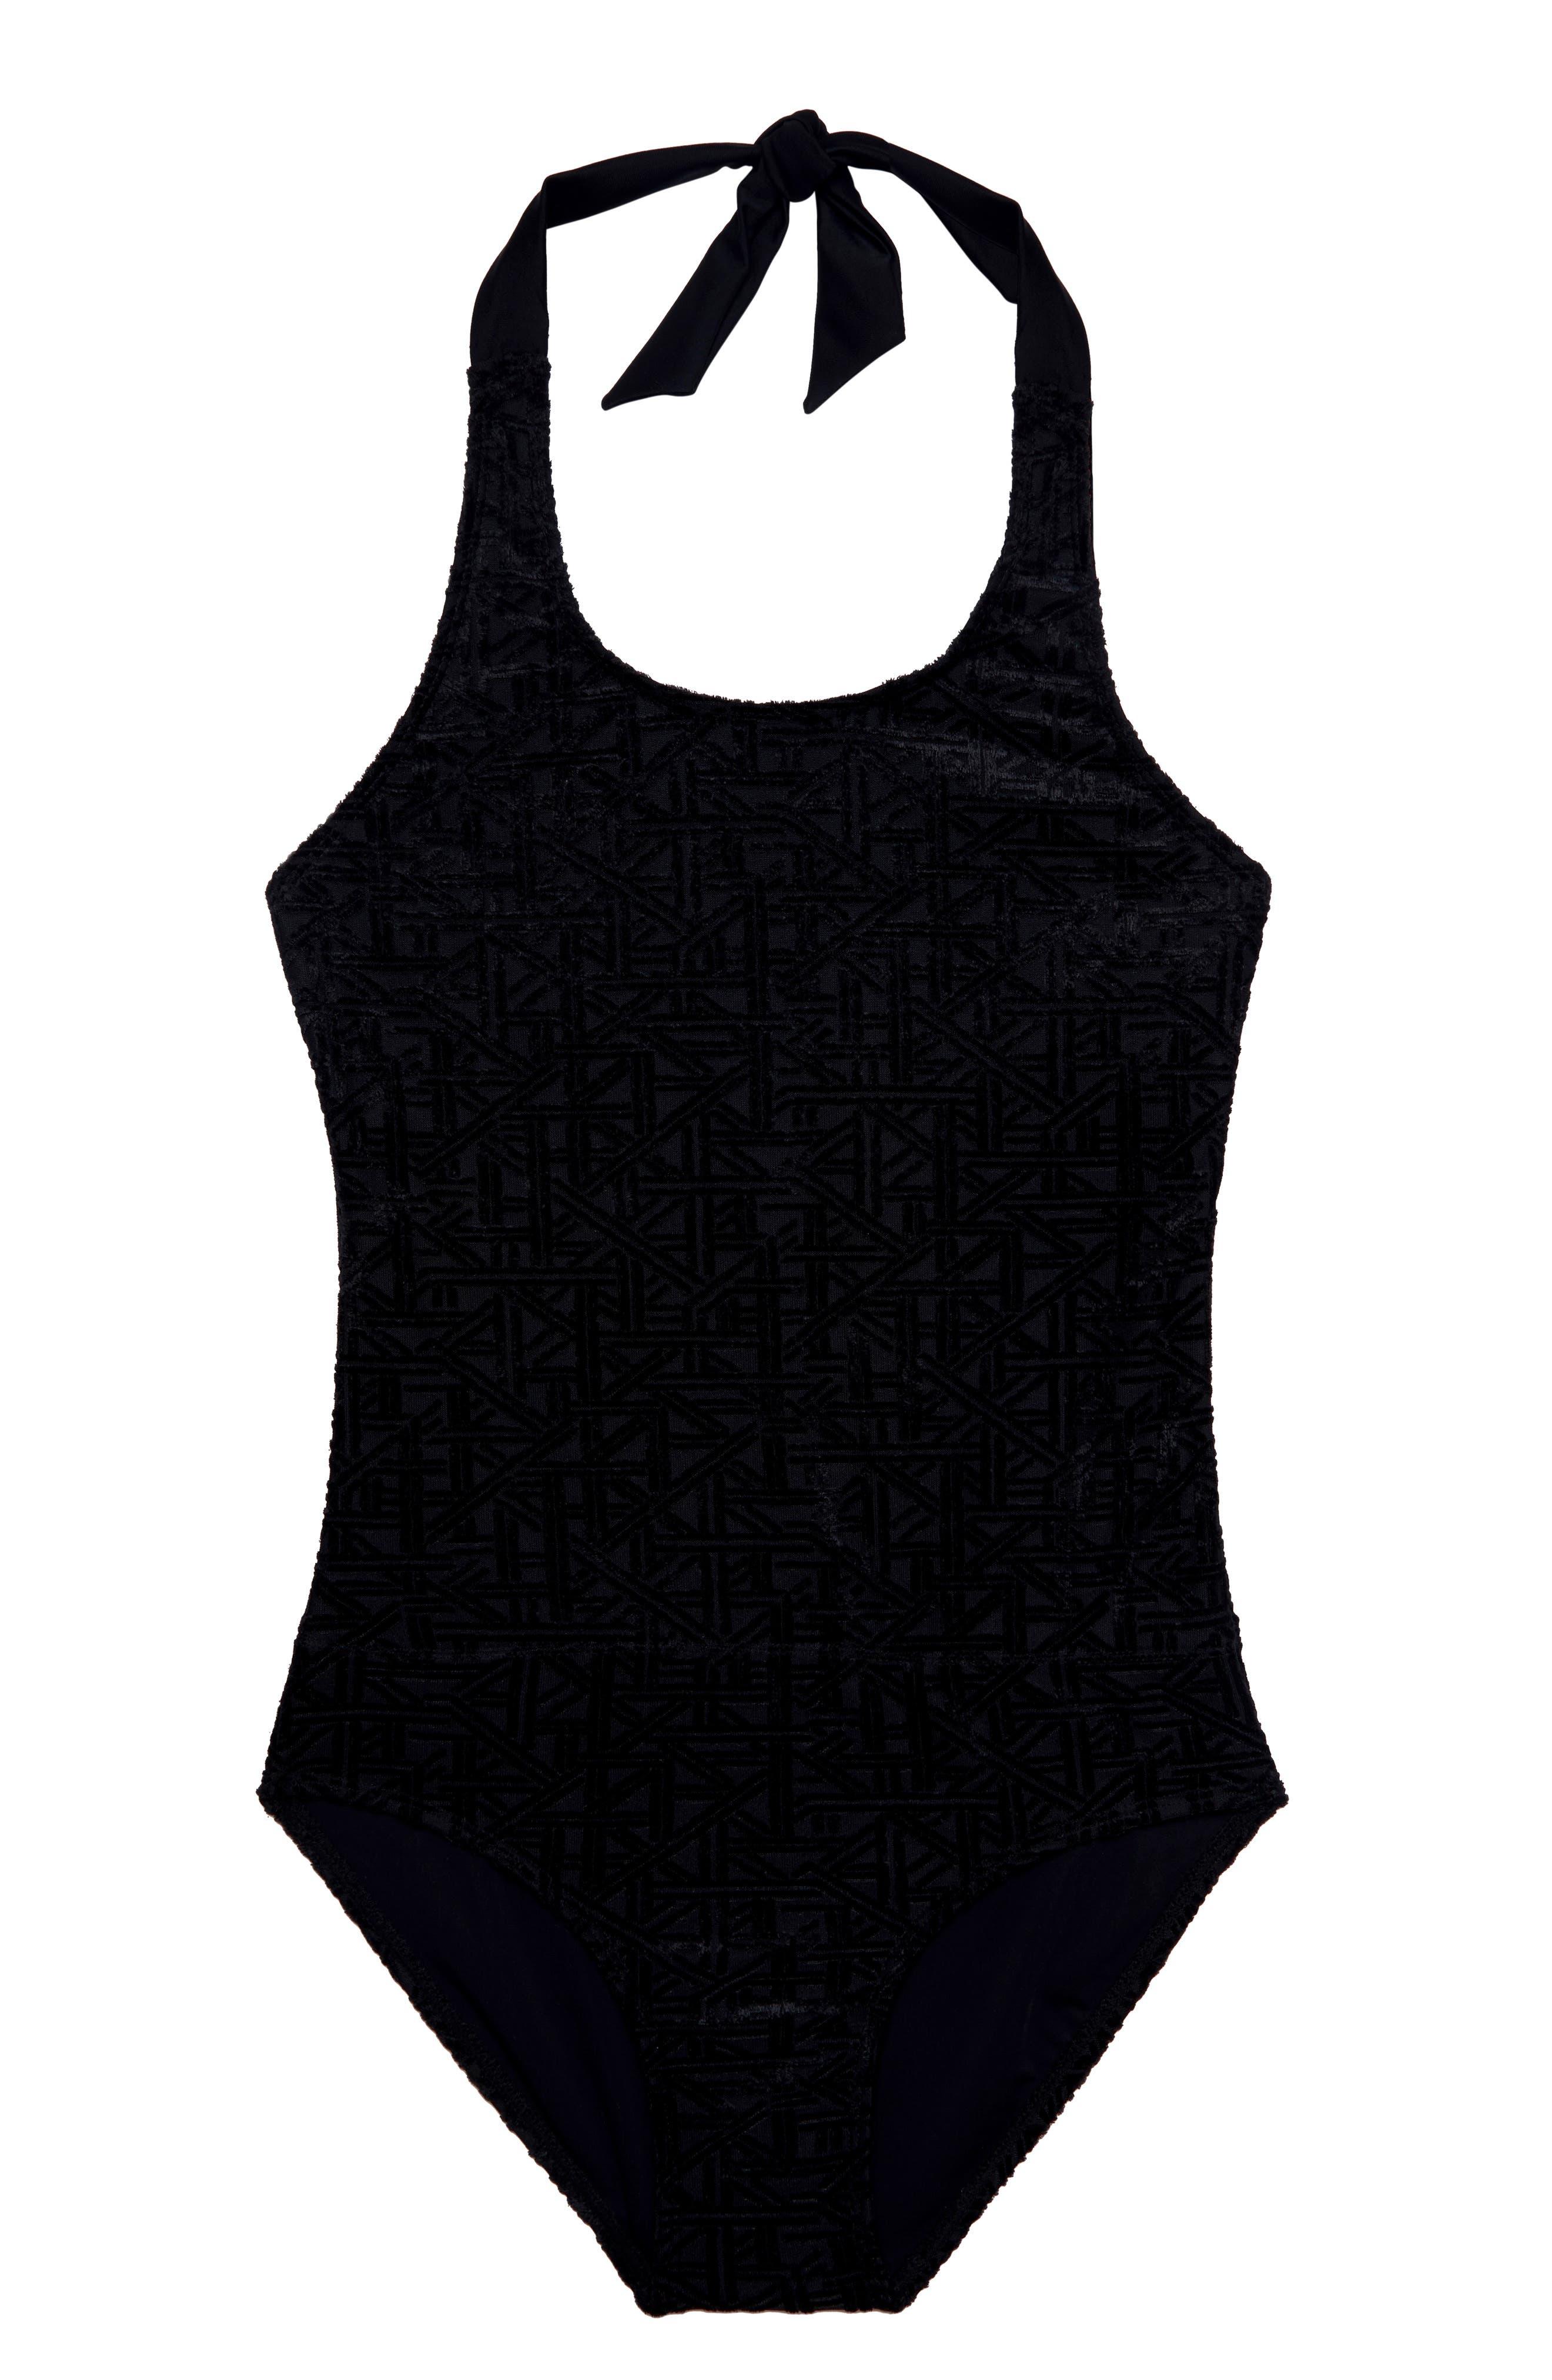 37b0456985 Girl's Gossip Girls One-Piece Swimsuit